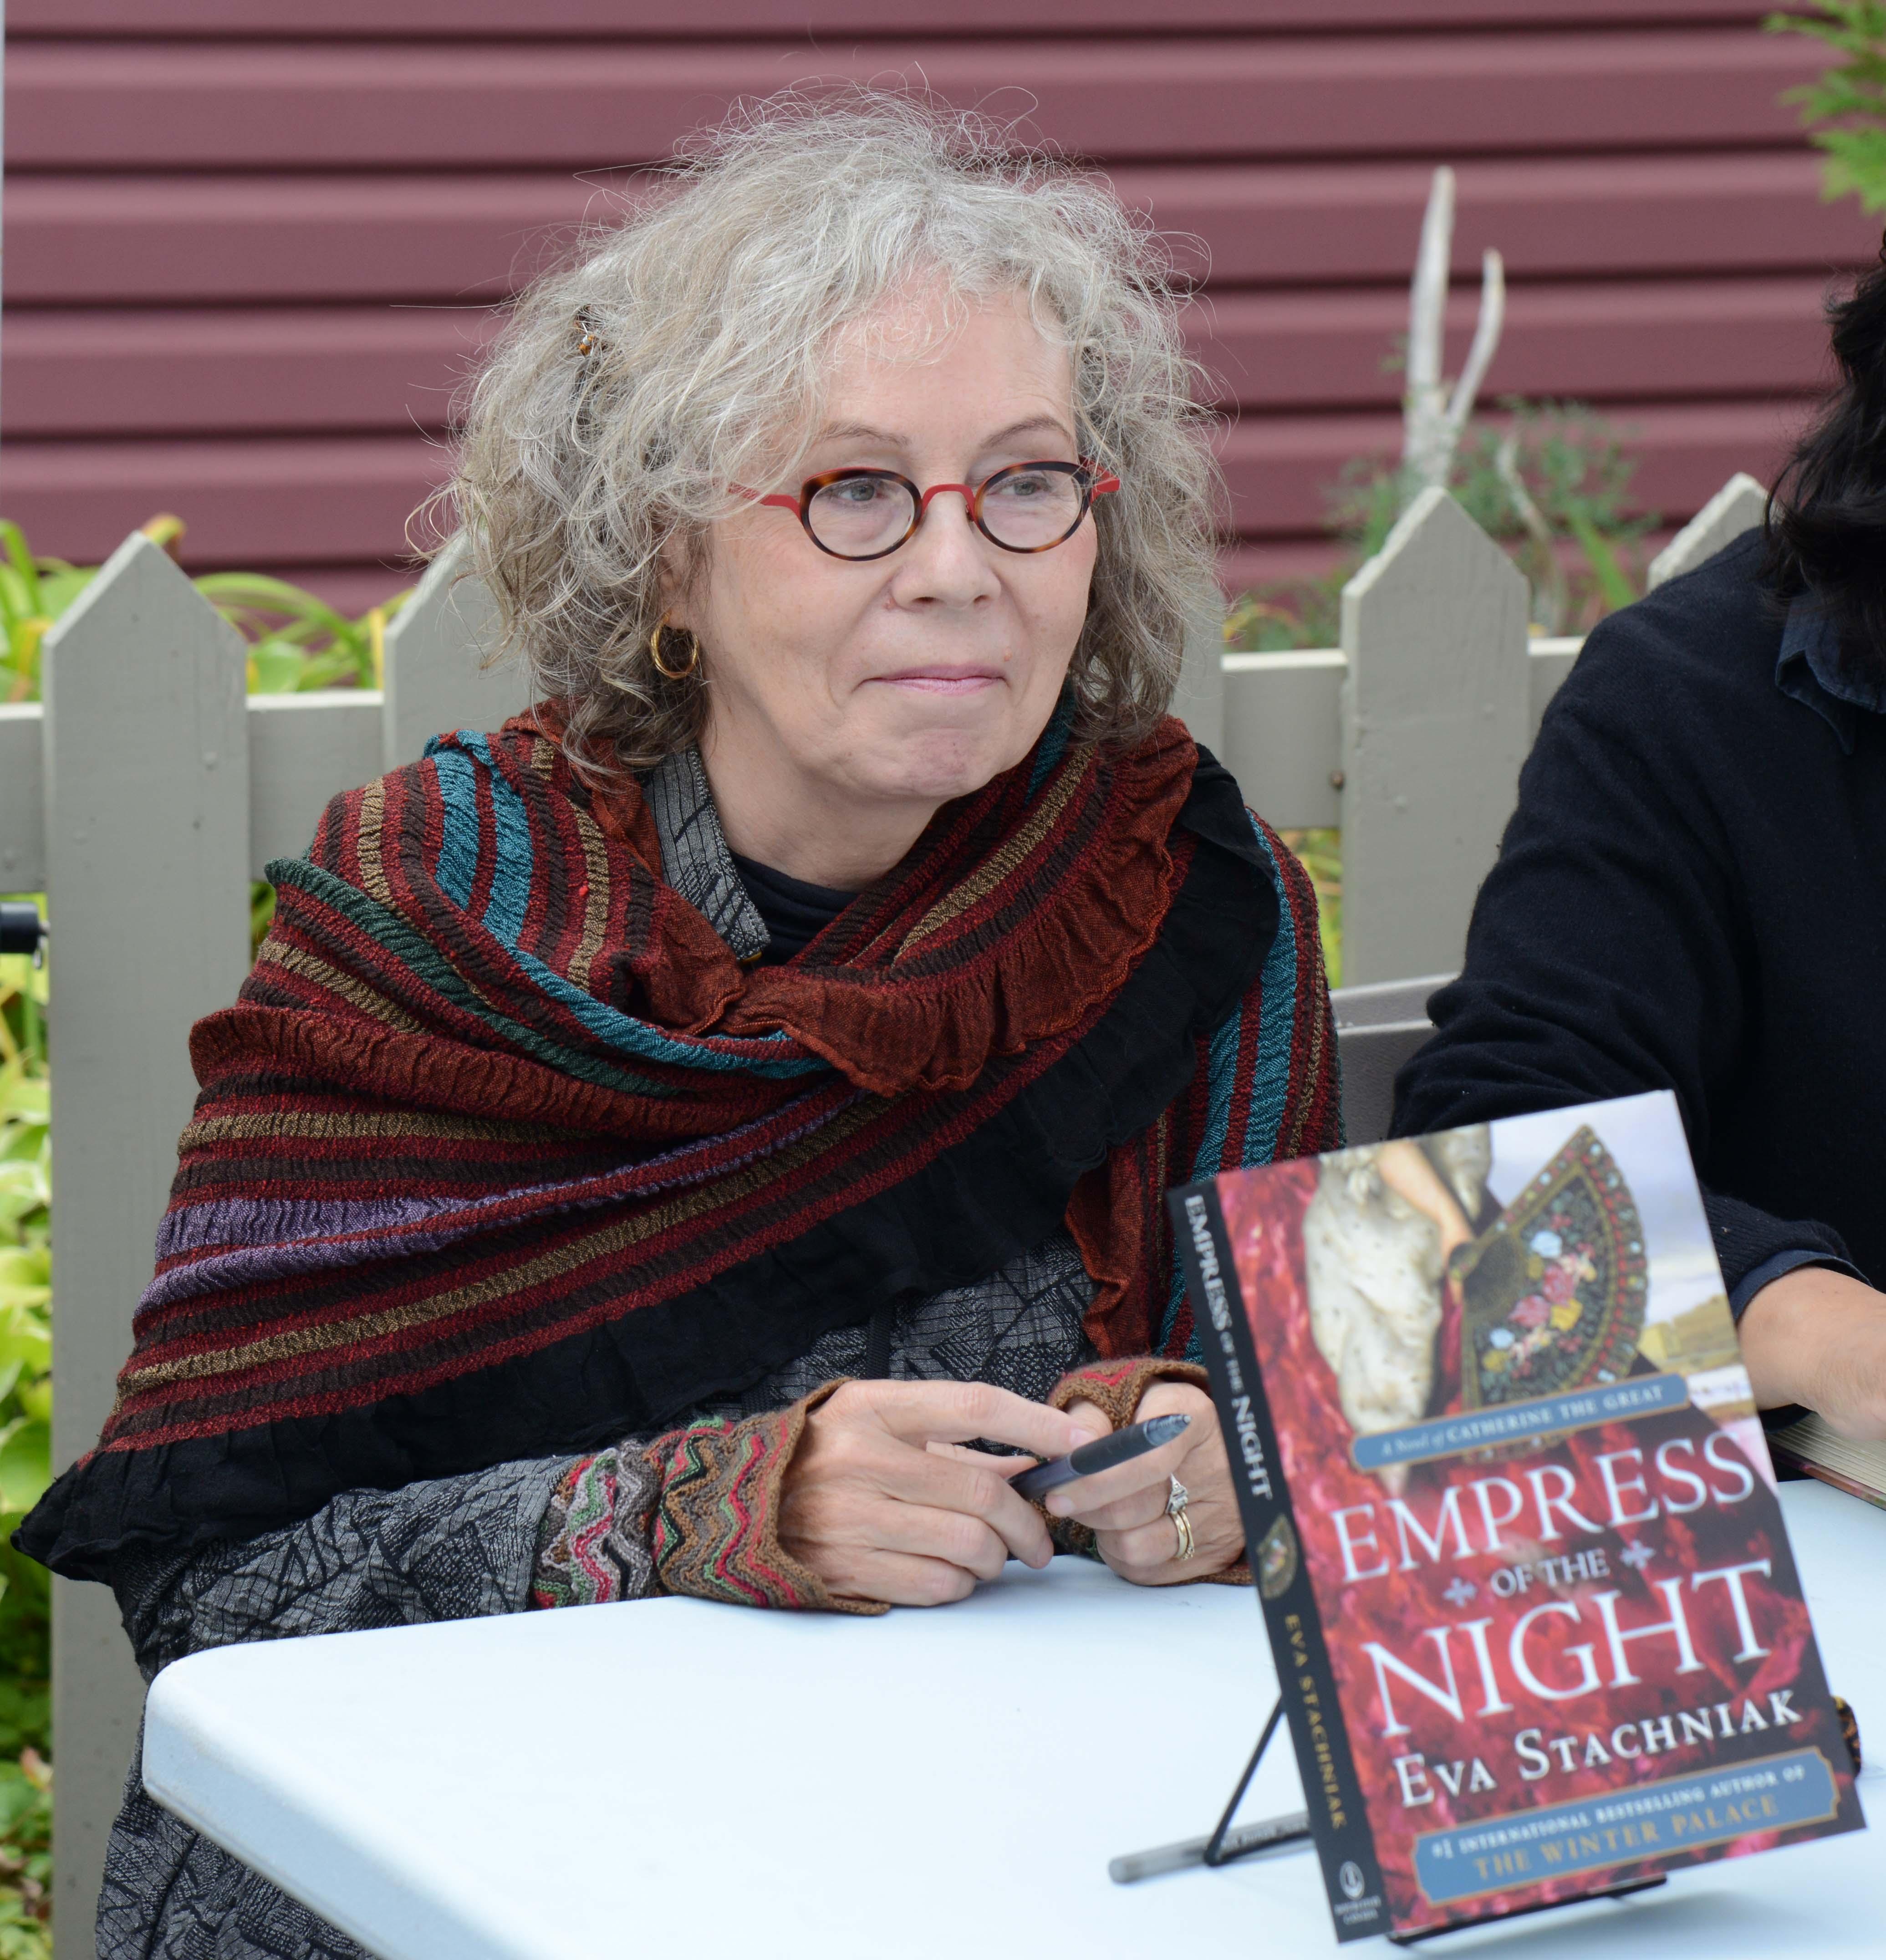 Stachniak at the [[Eden Mills Writers' Festival]] in 2014